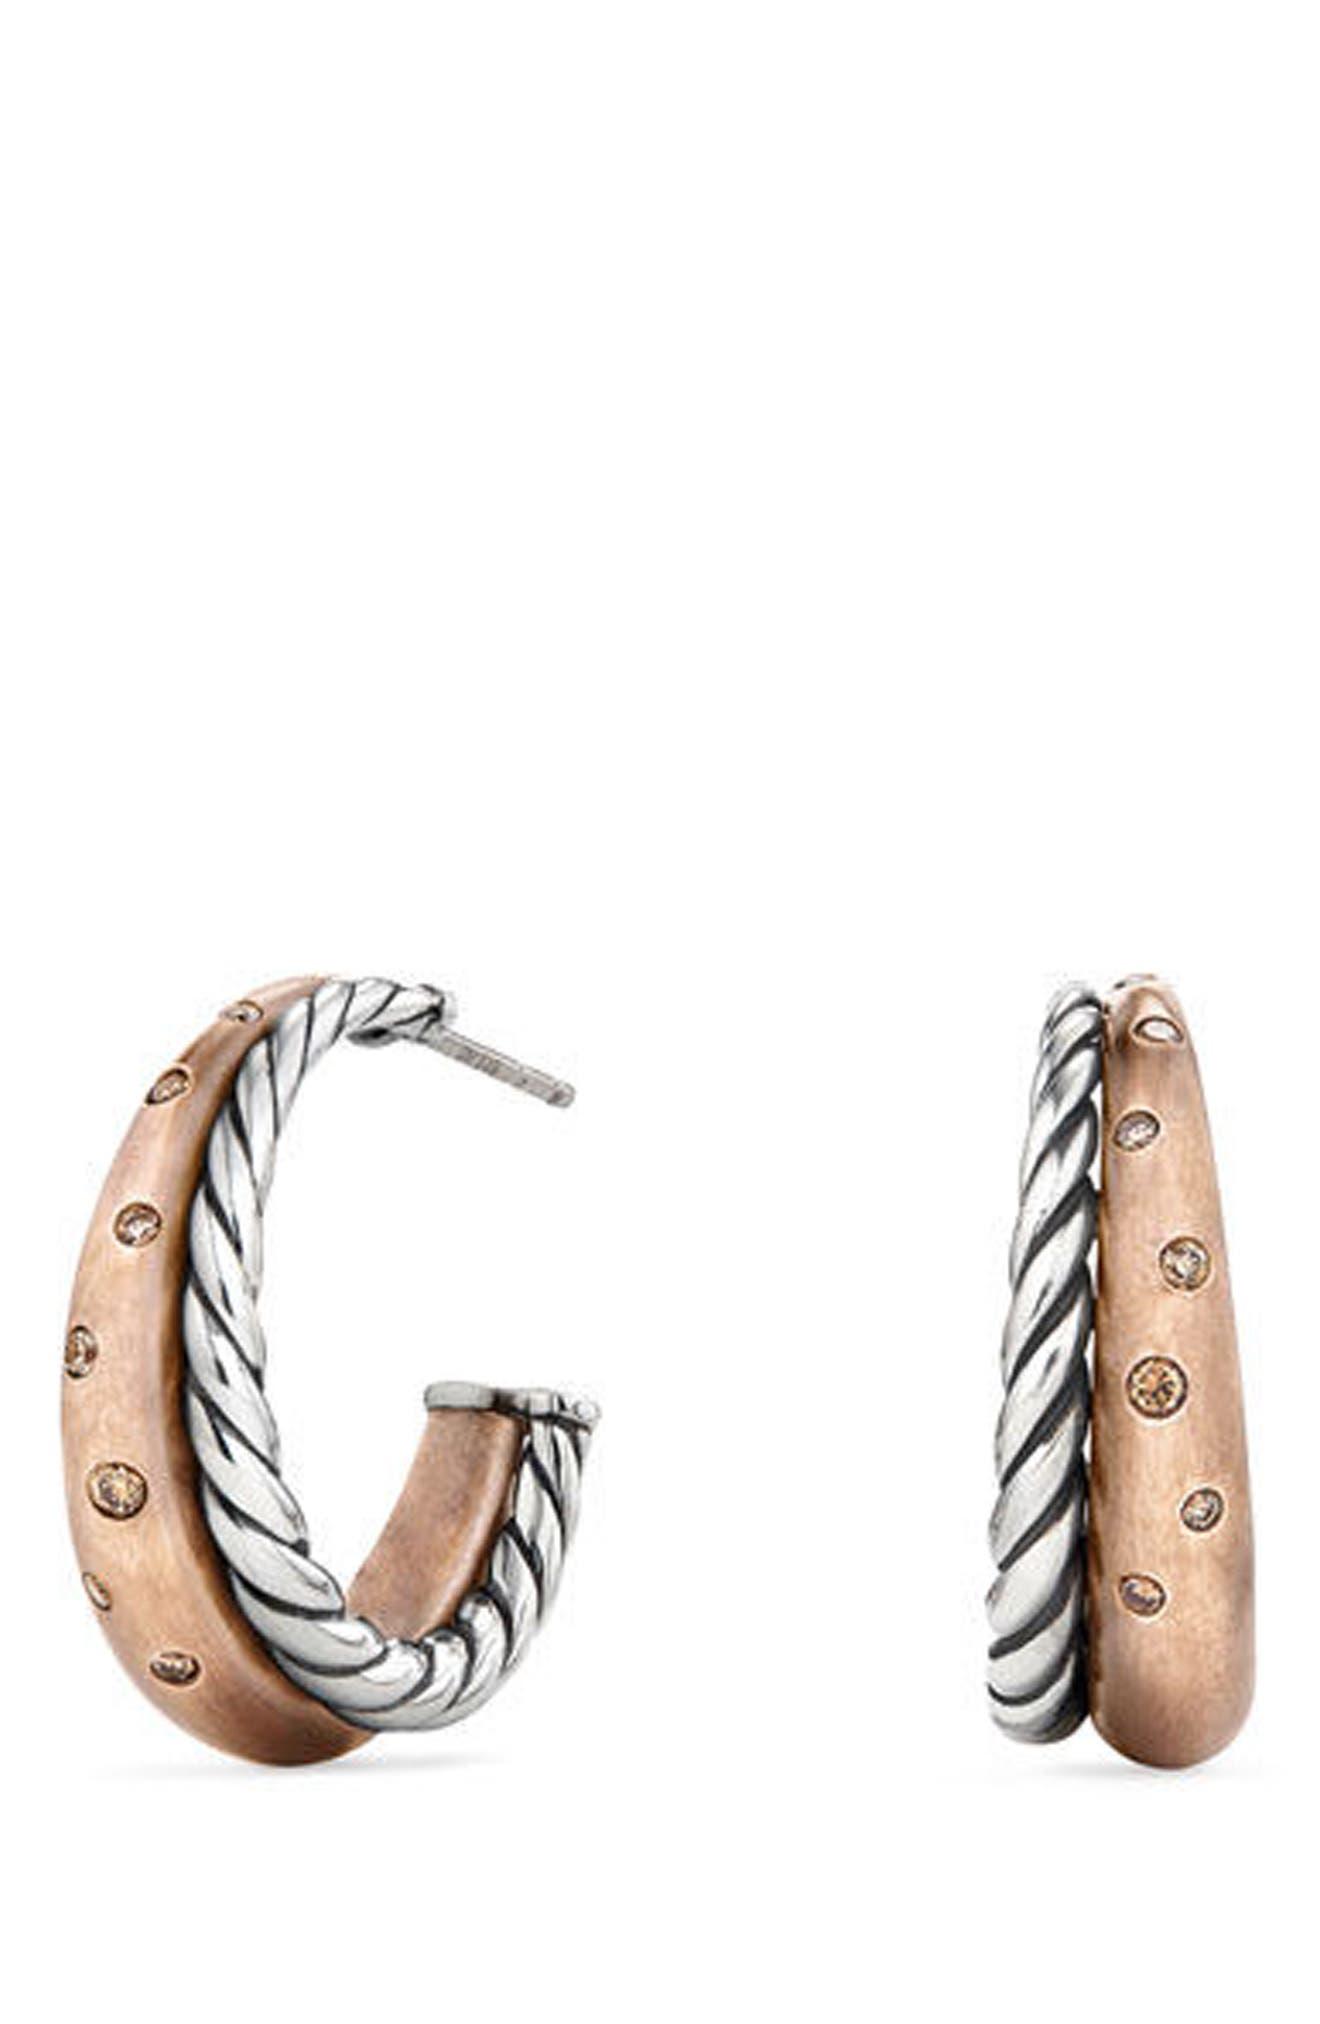 Main Image - David Yurman Pure Form Mixed Metal Hoop Earrings with Diamonds, Bronze & Silver, 26.5mm